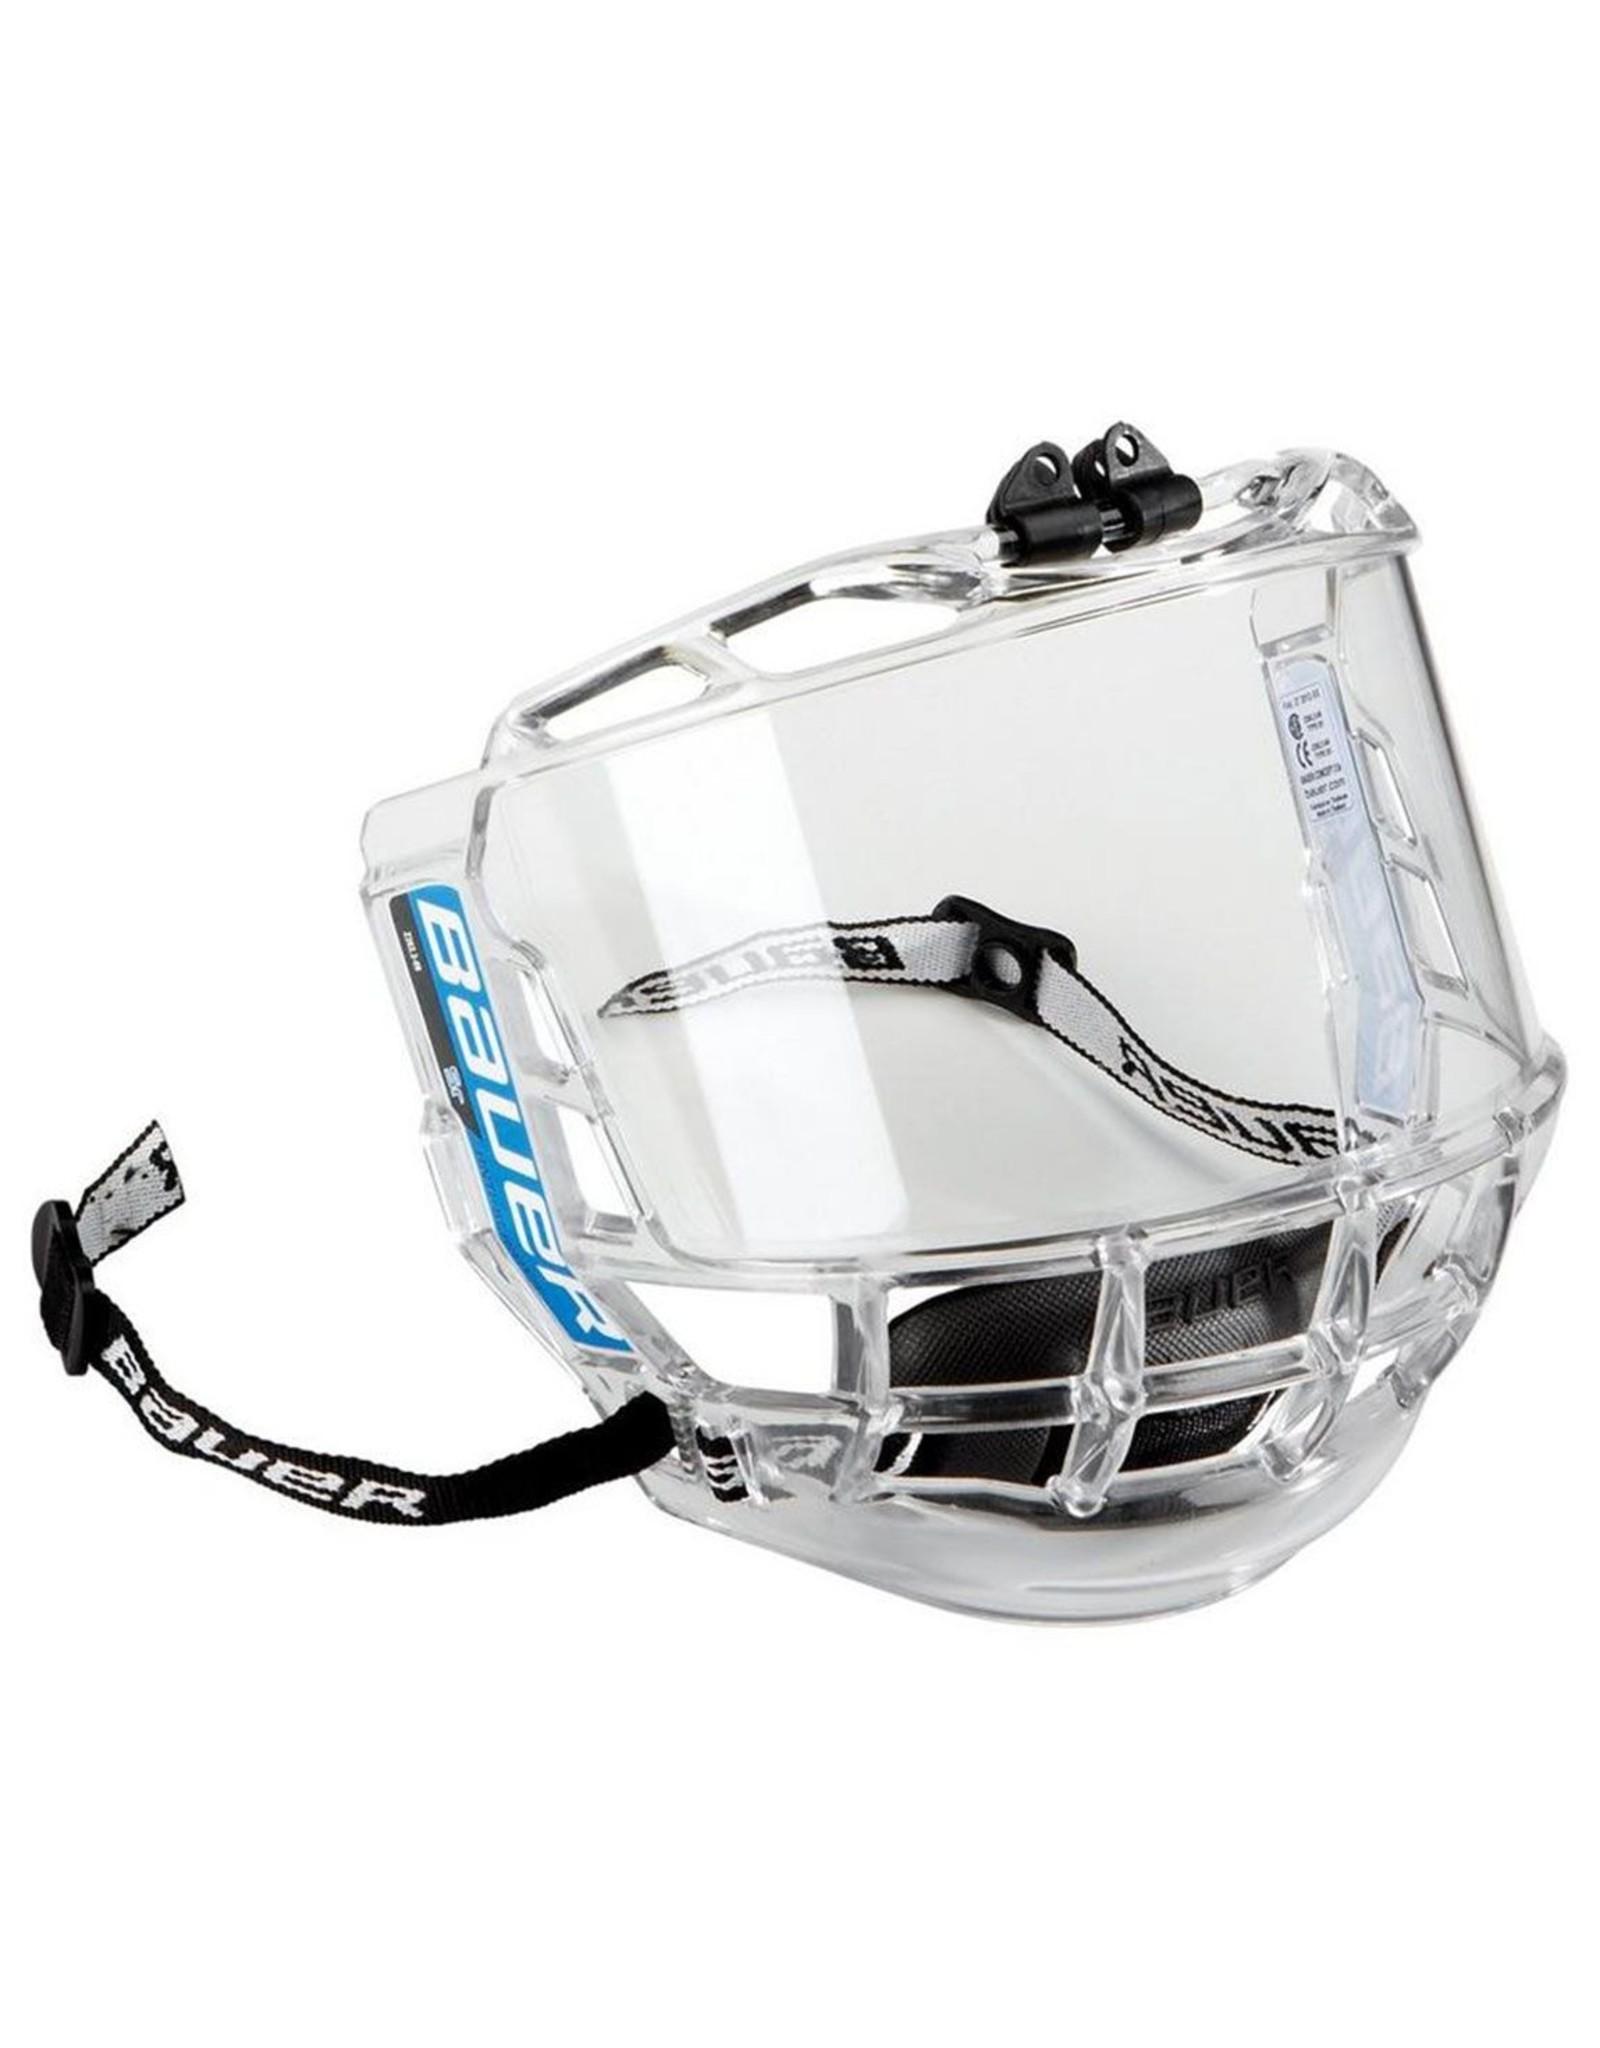 Bauer Hockey - Canada BAUER CONCEPT 3 FULL SHIELD - SR